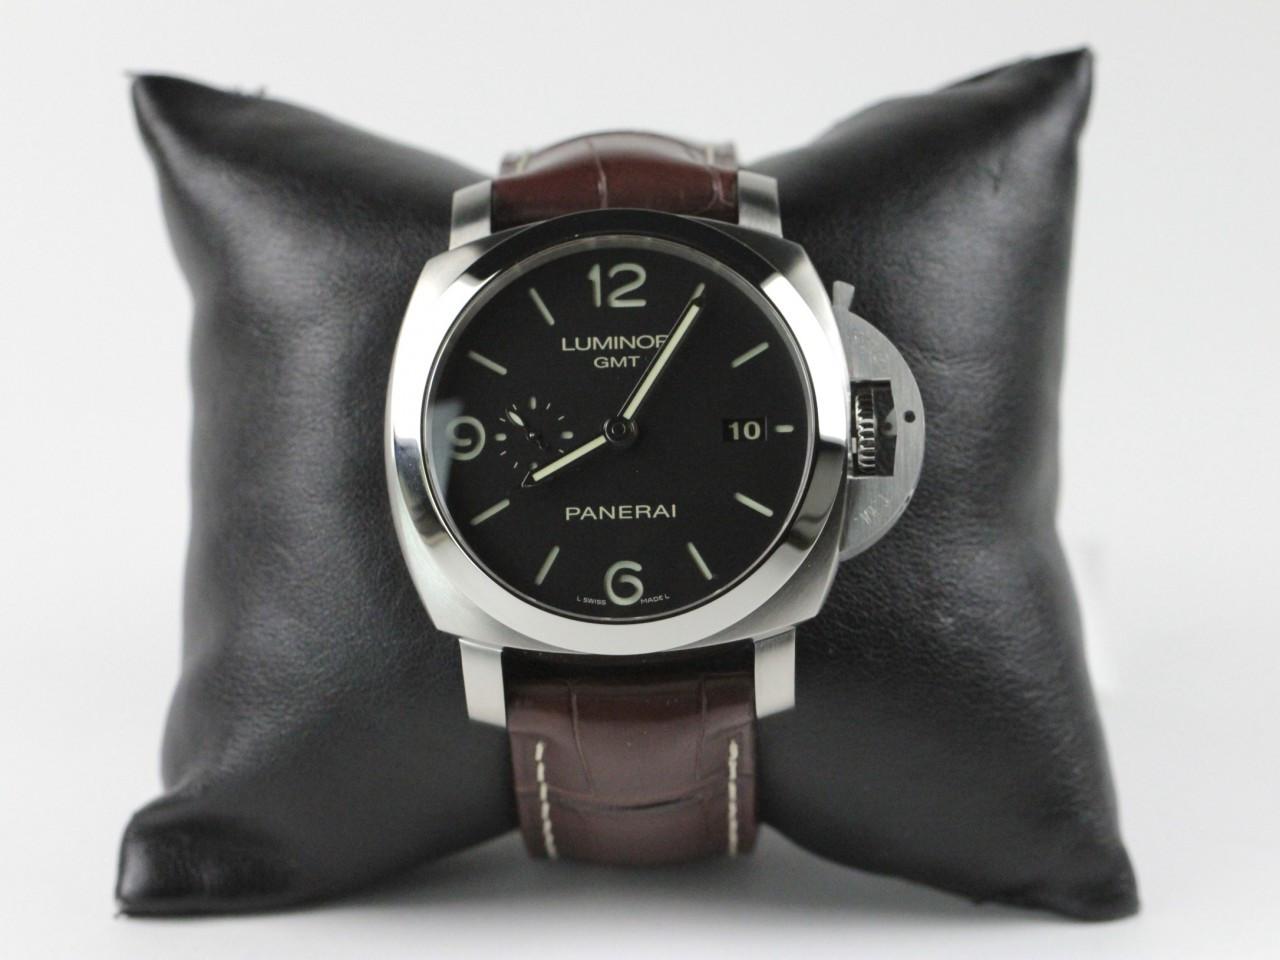 db852161476e ... Officine Panerai Watch - Luminor GMT 1950 PAM 320. Image 1. Image 1   Image 2  Image 3  Image 4